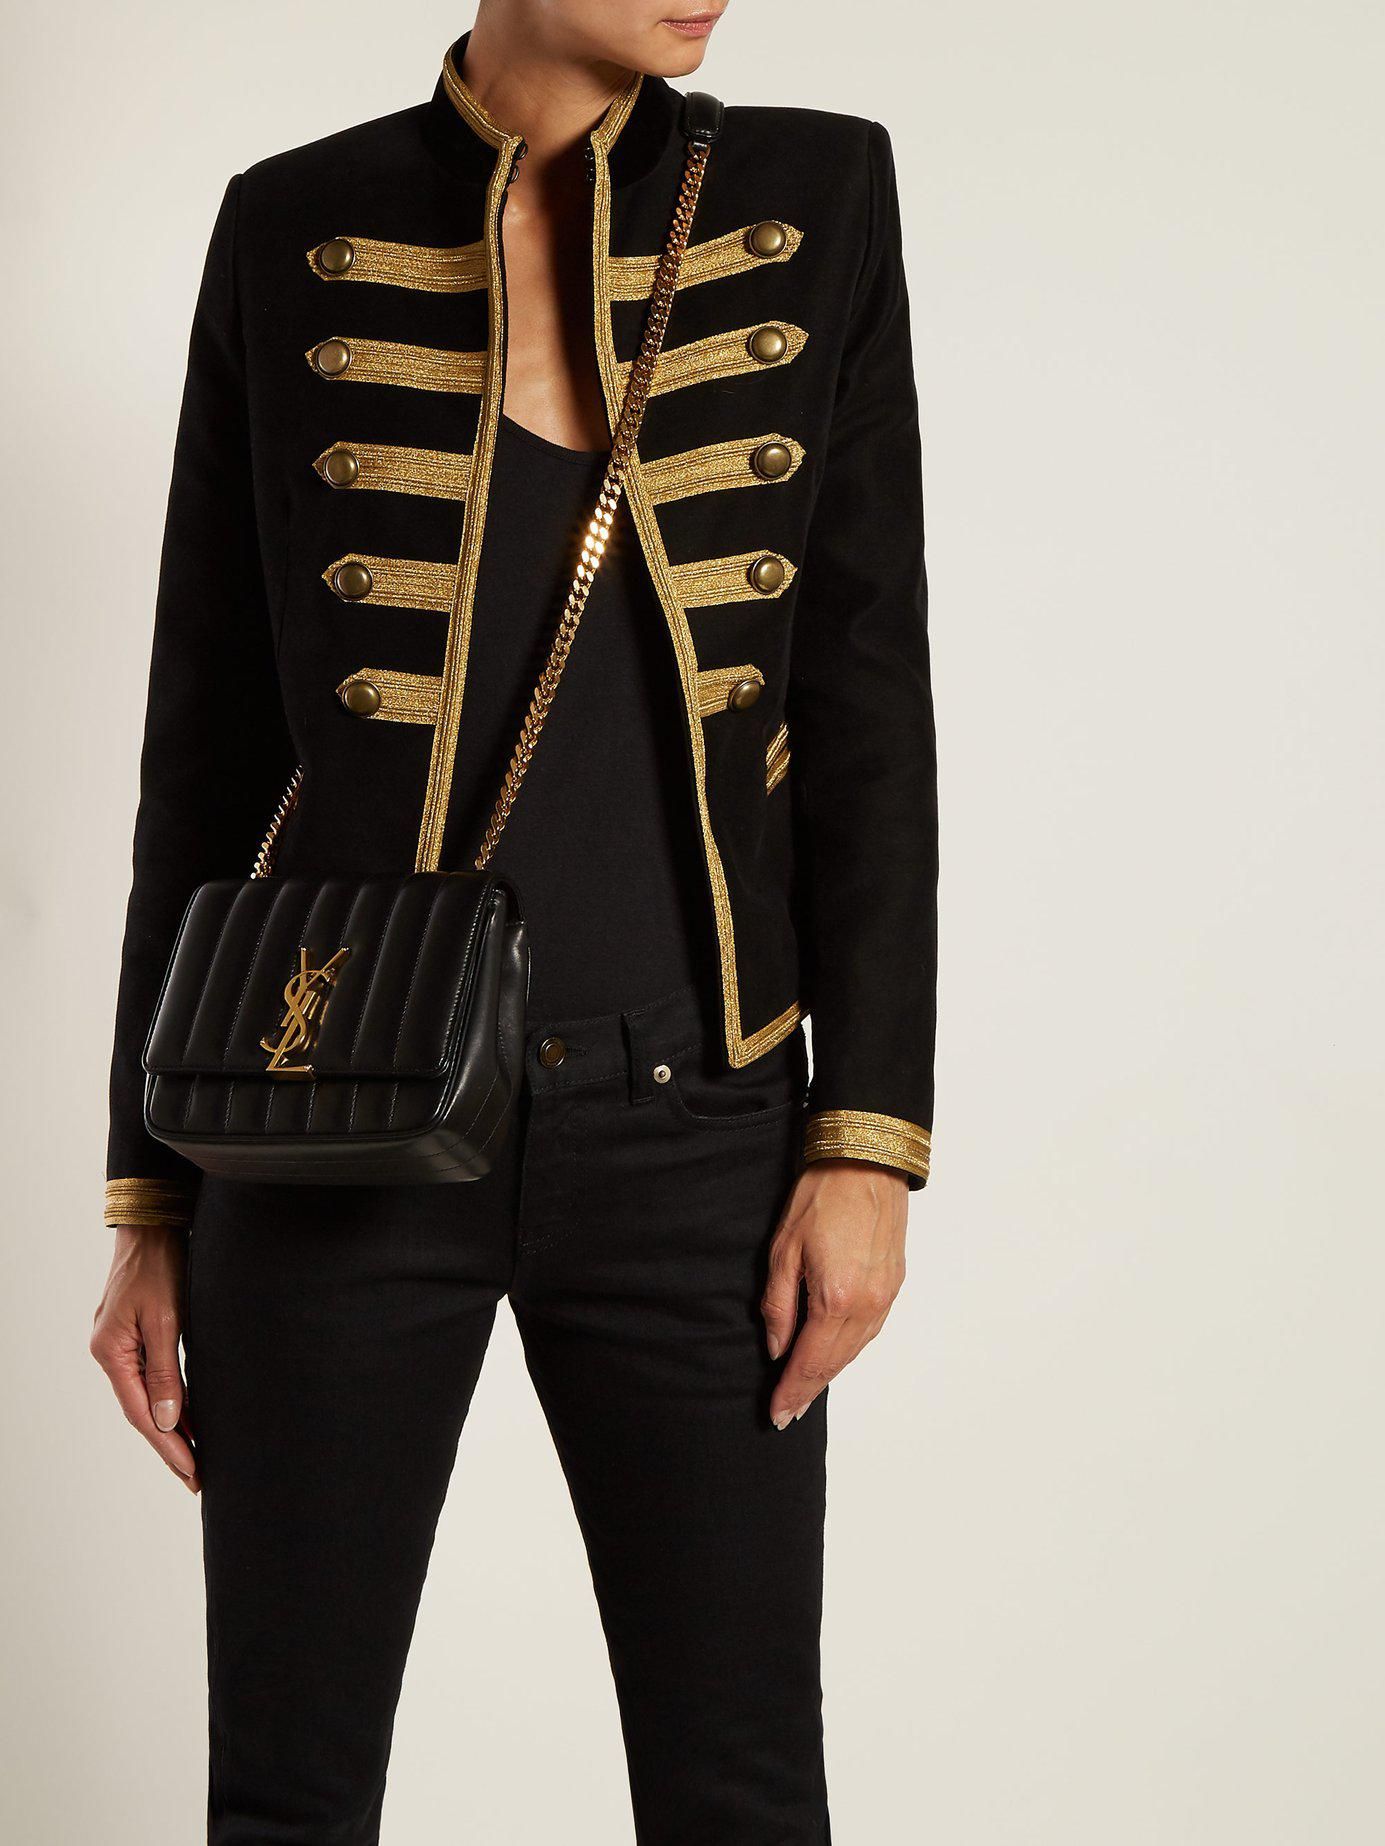 e511cafdc5 Saint Laurent Sulpice Medium Leather Bag in Black - Lyst